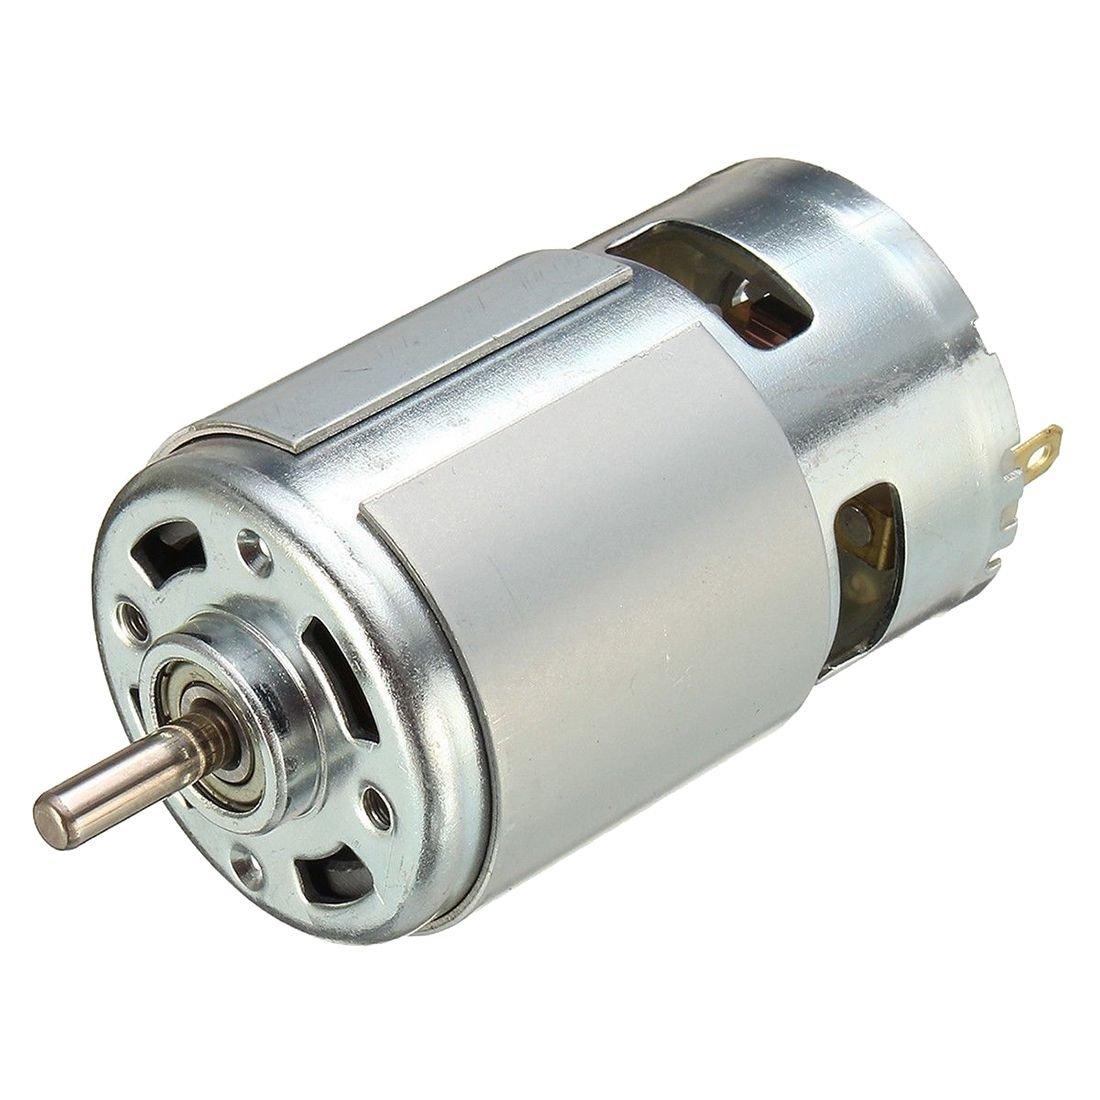 TOOGOO(R) 775 DC 12V-36V 3500-9000RPM Motor Large Torque Ball Bearing High Power Low Noise